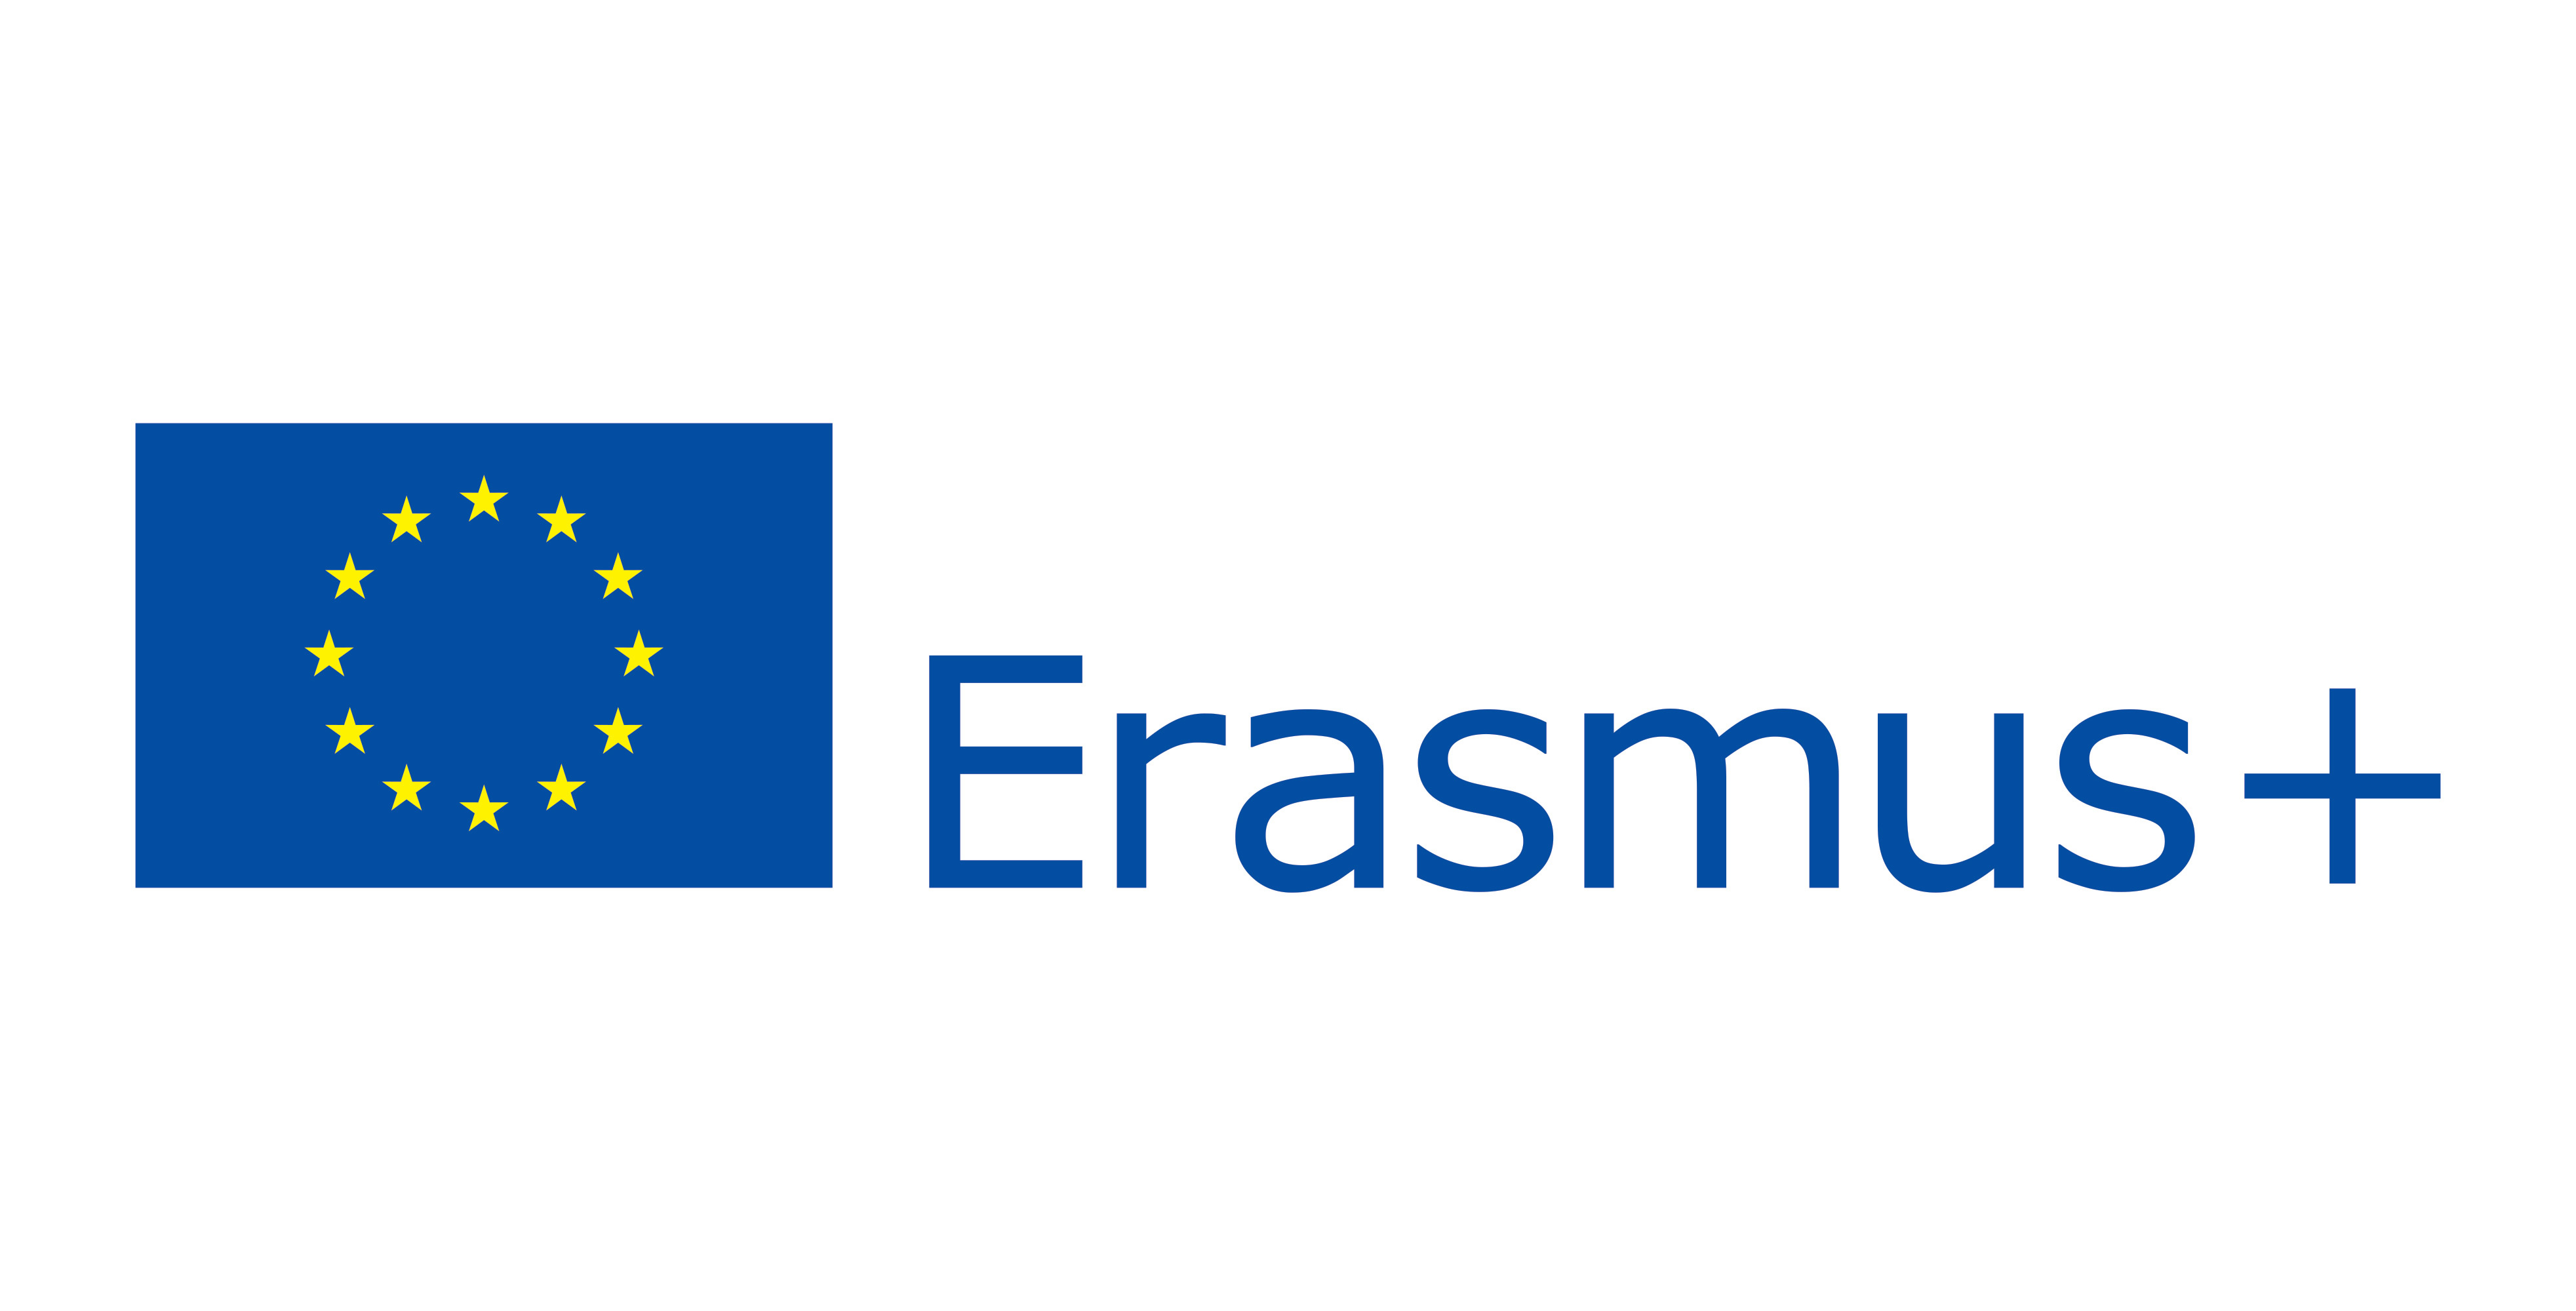 Erasmus+ program